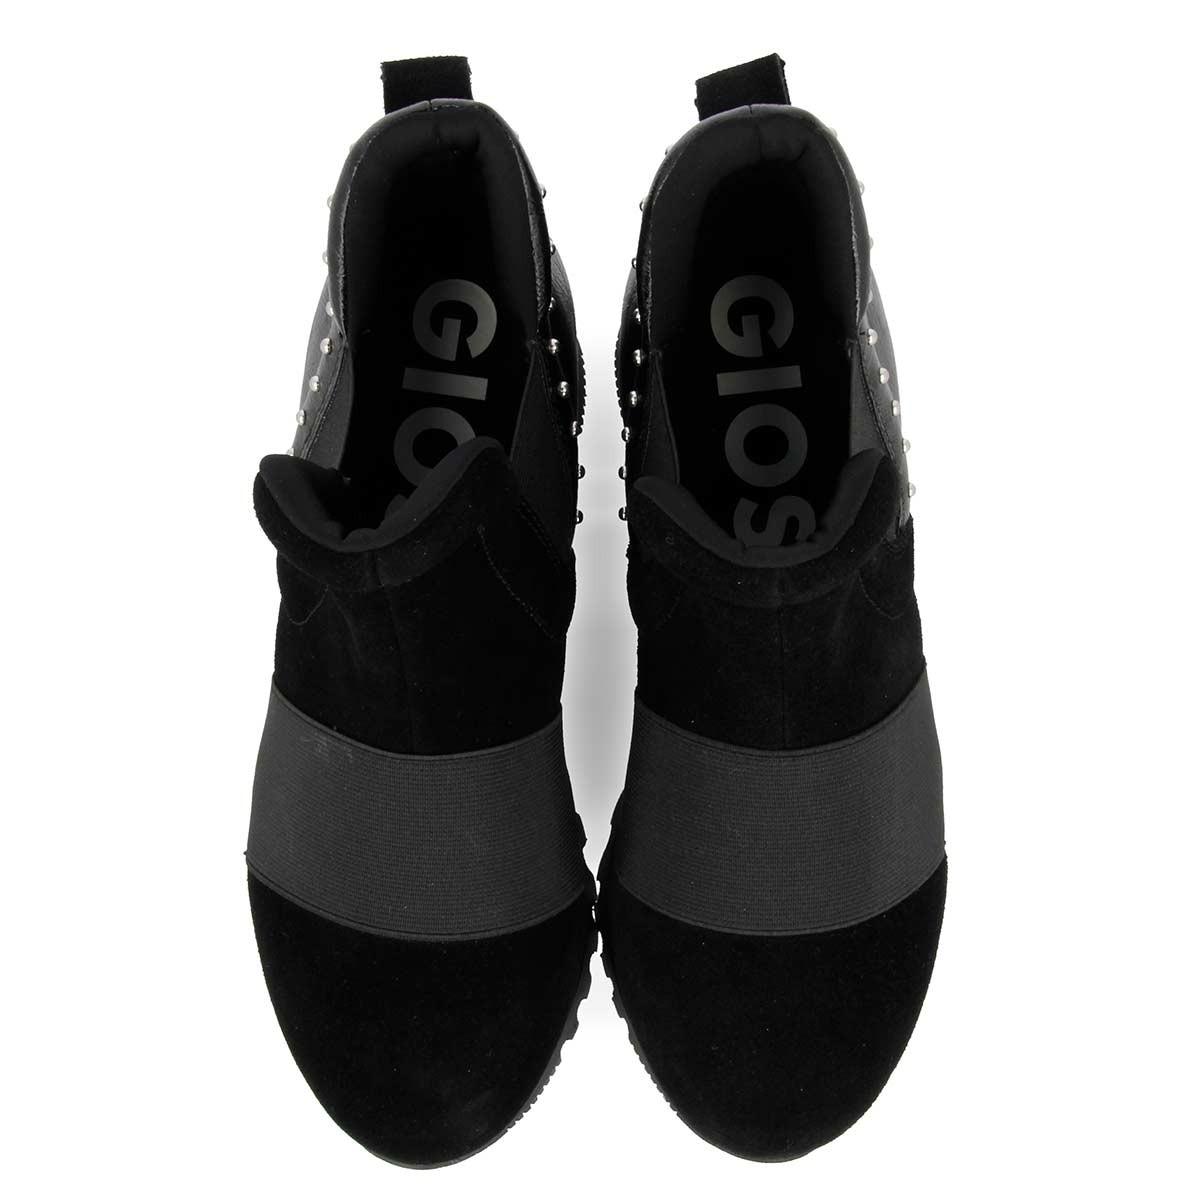 56906 Black CASUAL-SPORT 5